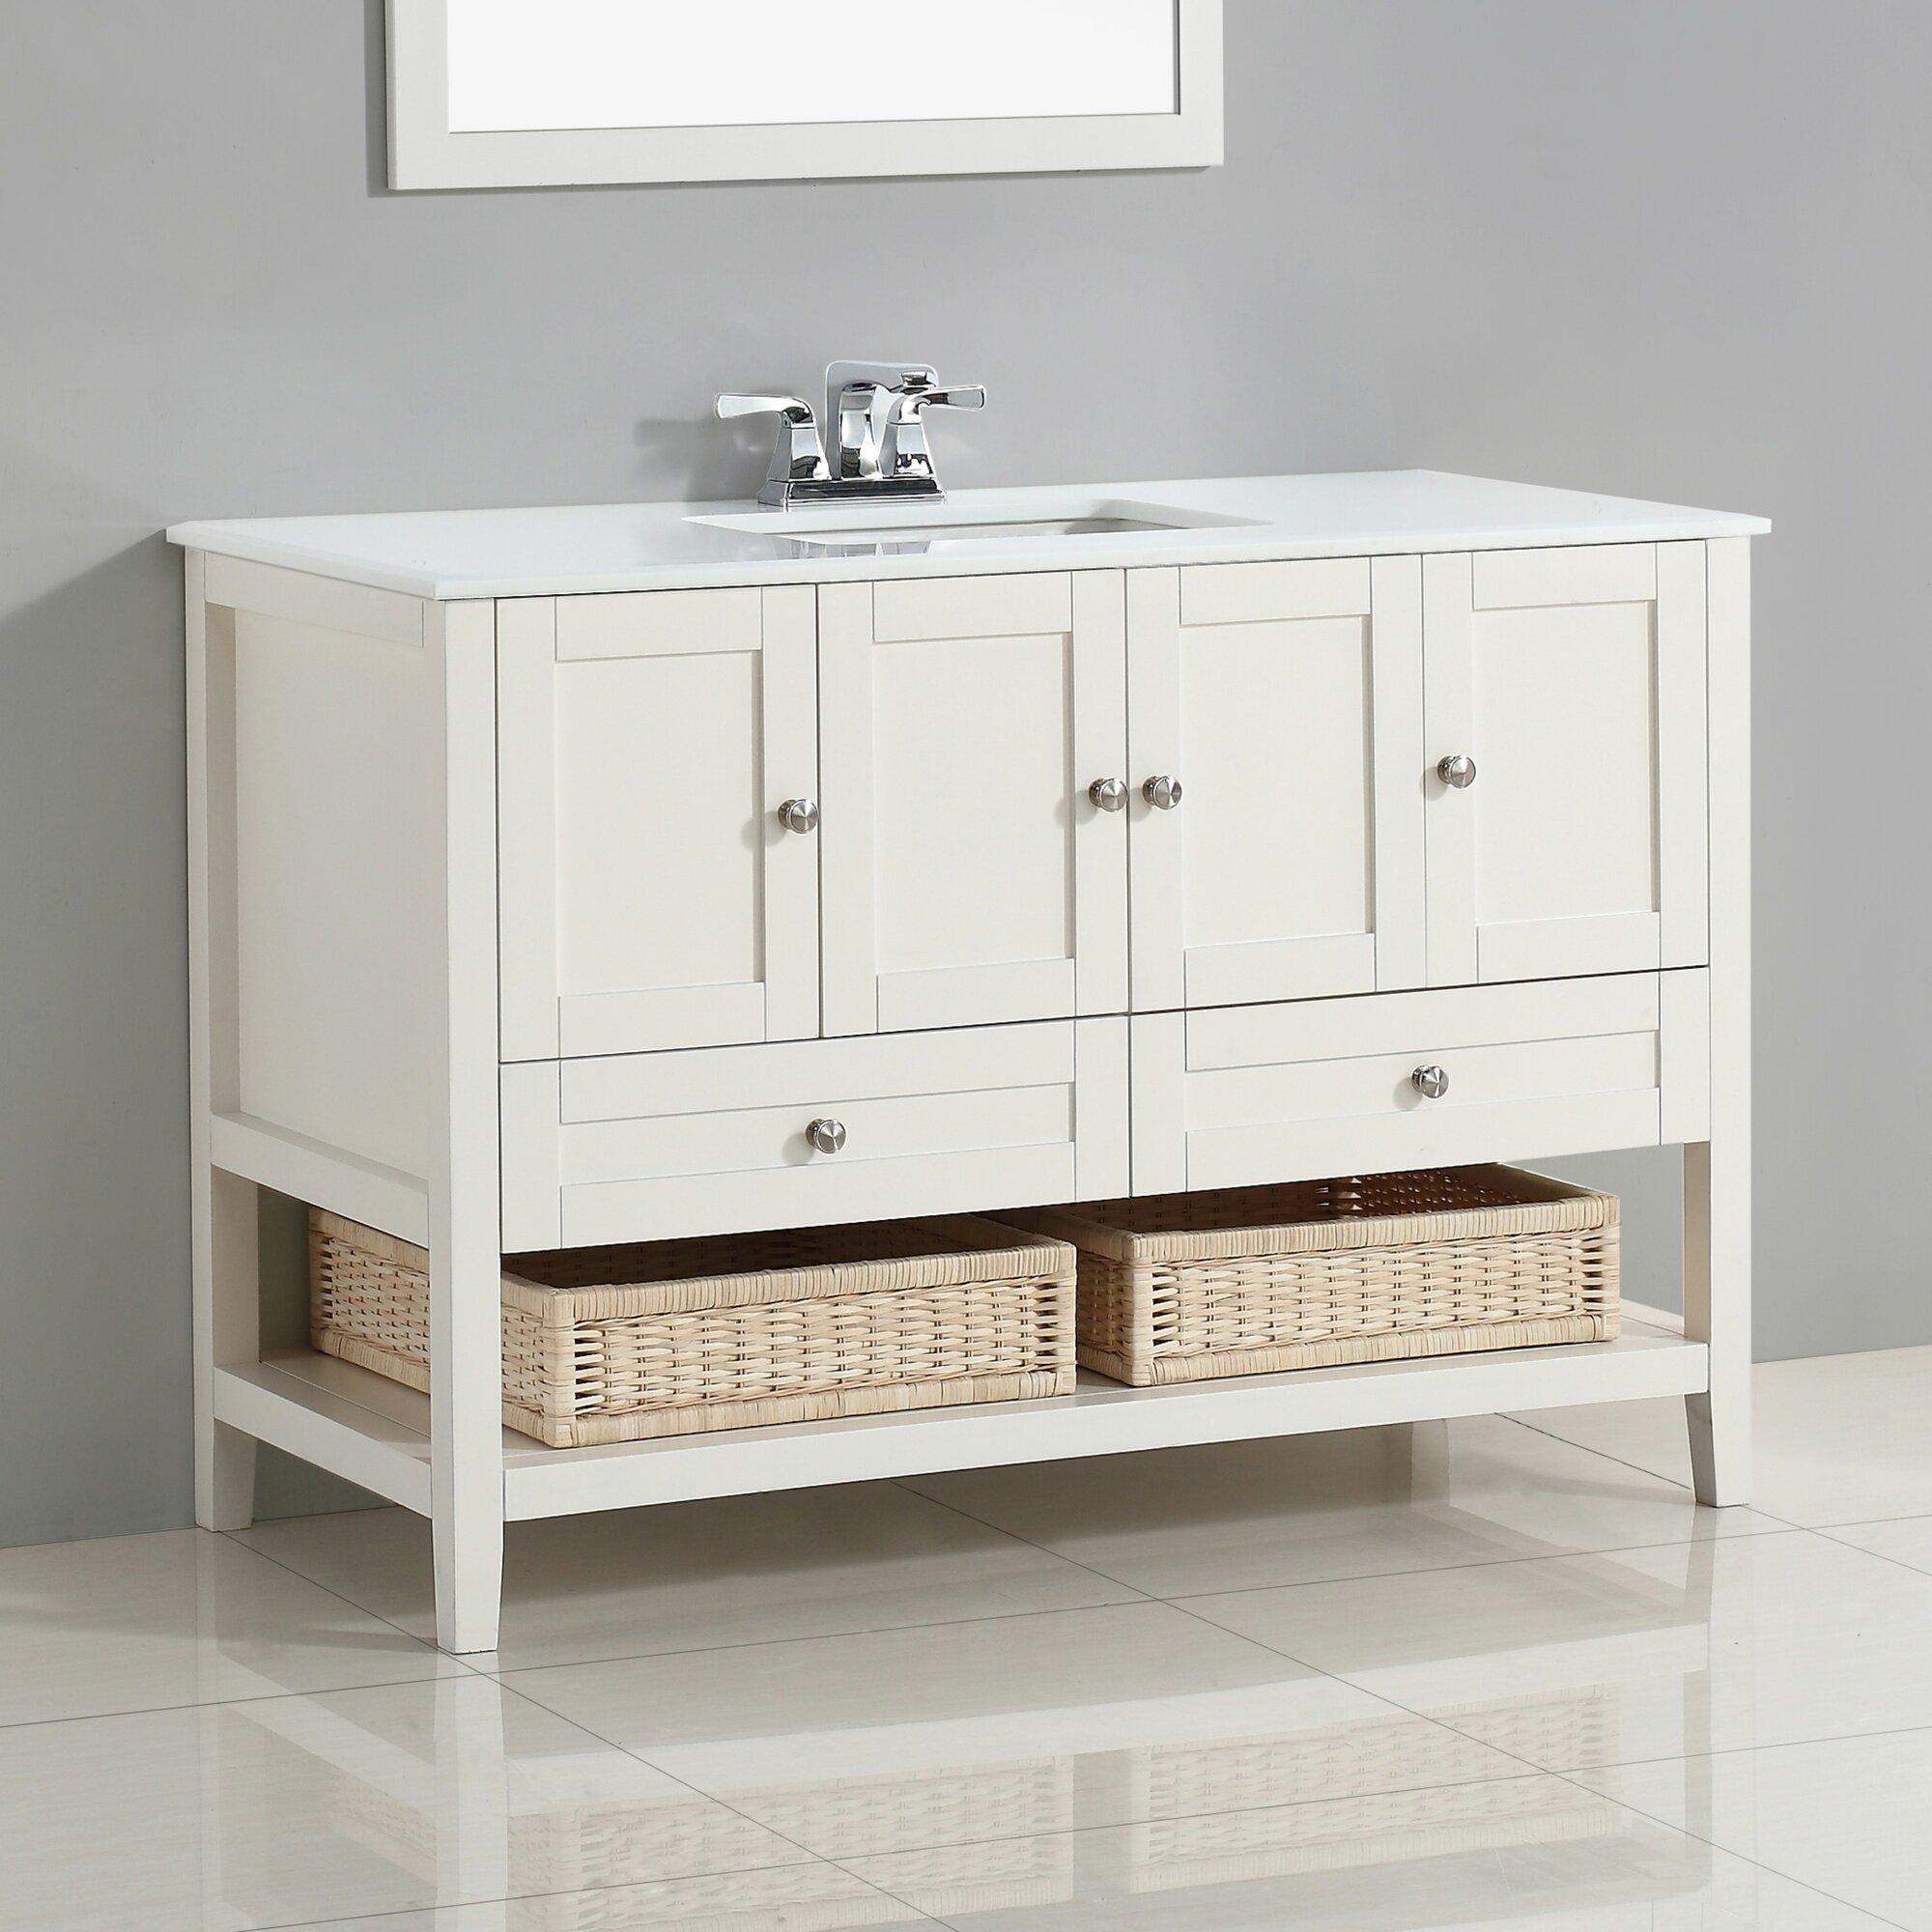 simpli home cape cod 49 single bathroom vanity set reviews wayfair. Black Bedroom Furniture Sets. Home Design Ideas